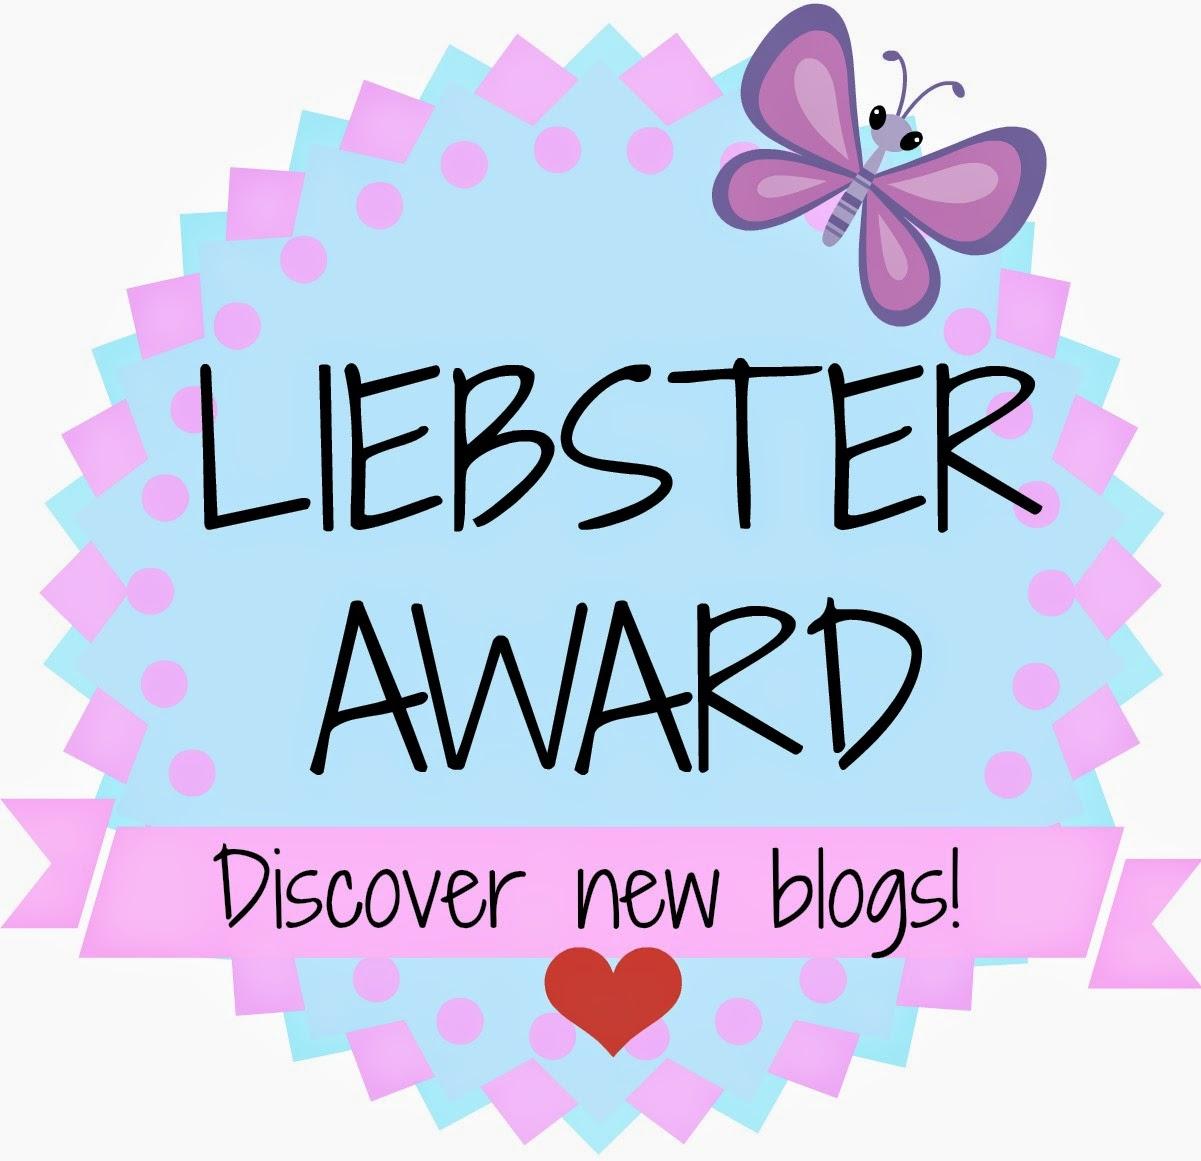 Assegnazione Liebster Award 2016